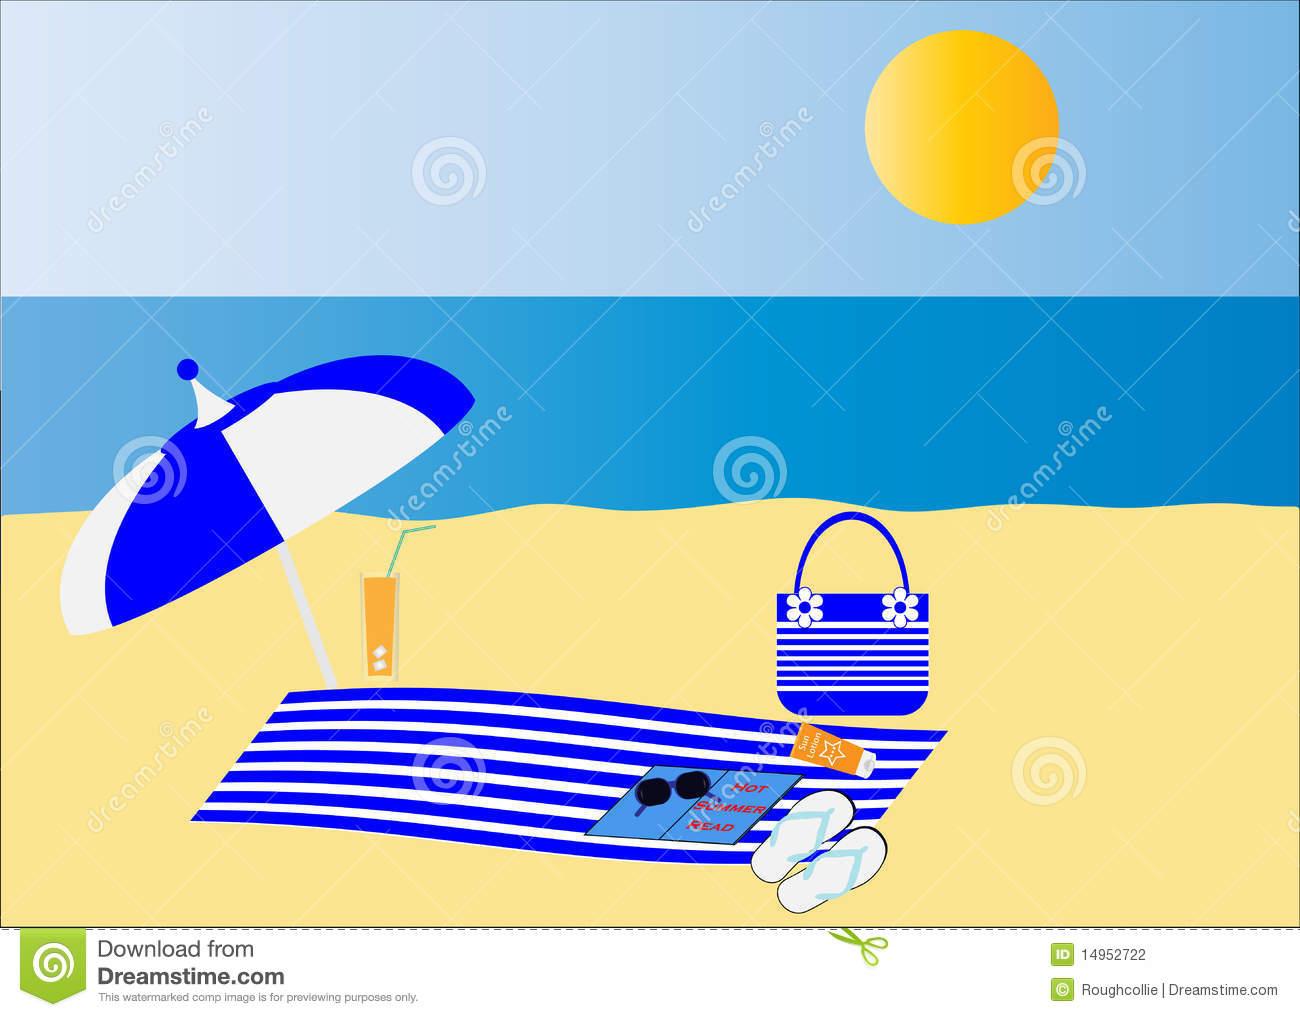 Seaside clipart #2, Download drawings